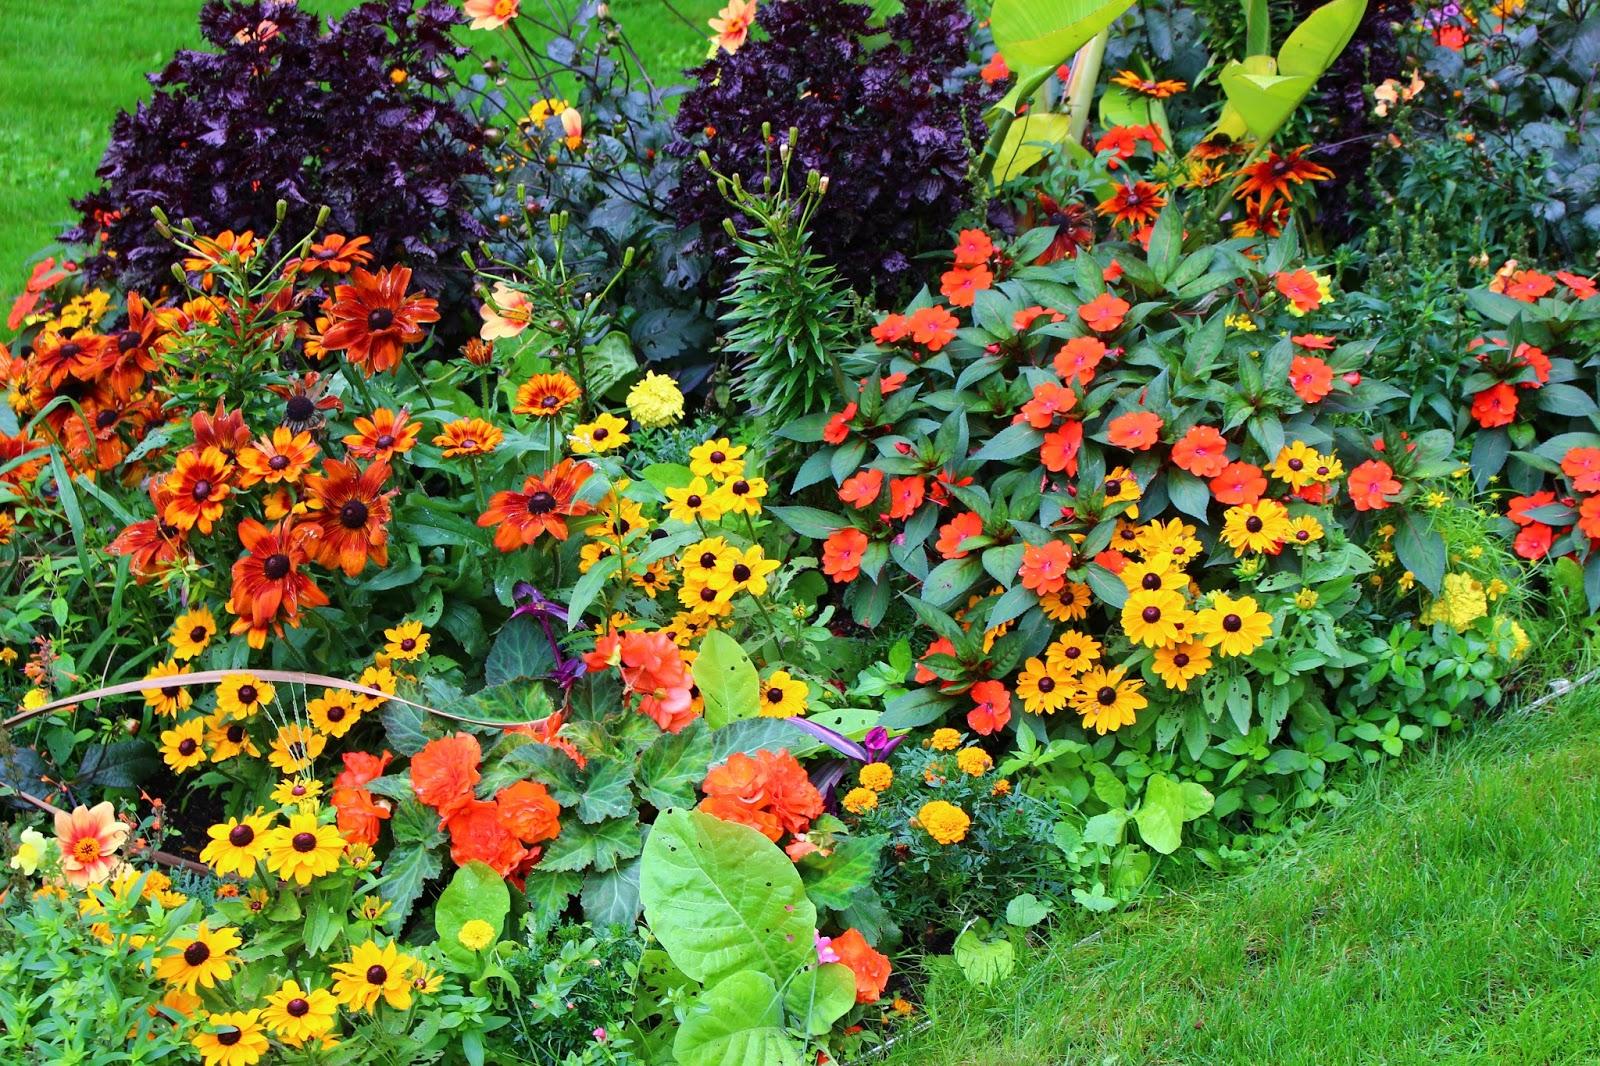 roses du jardin ch neland un beau massif de plantes. Black Bedroom Furniture Sets. Home Design Ideas